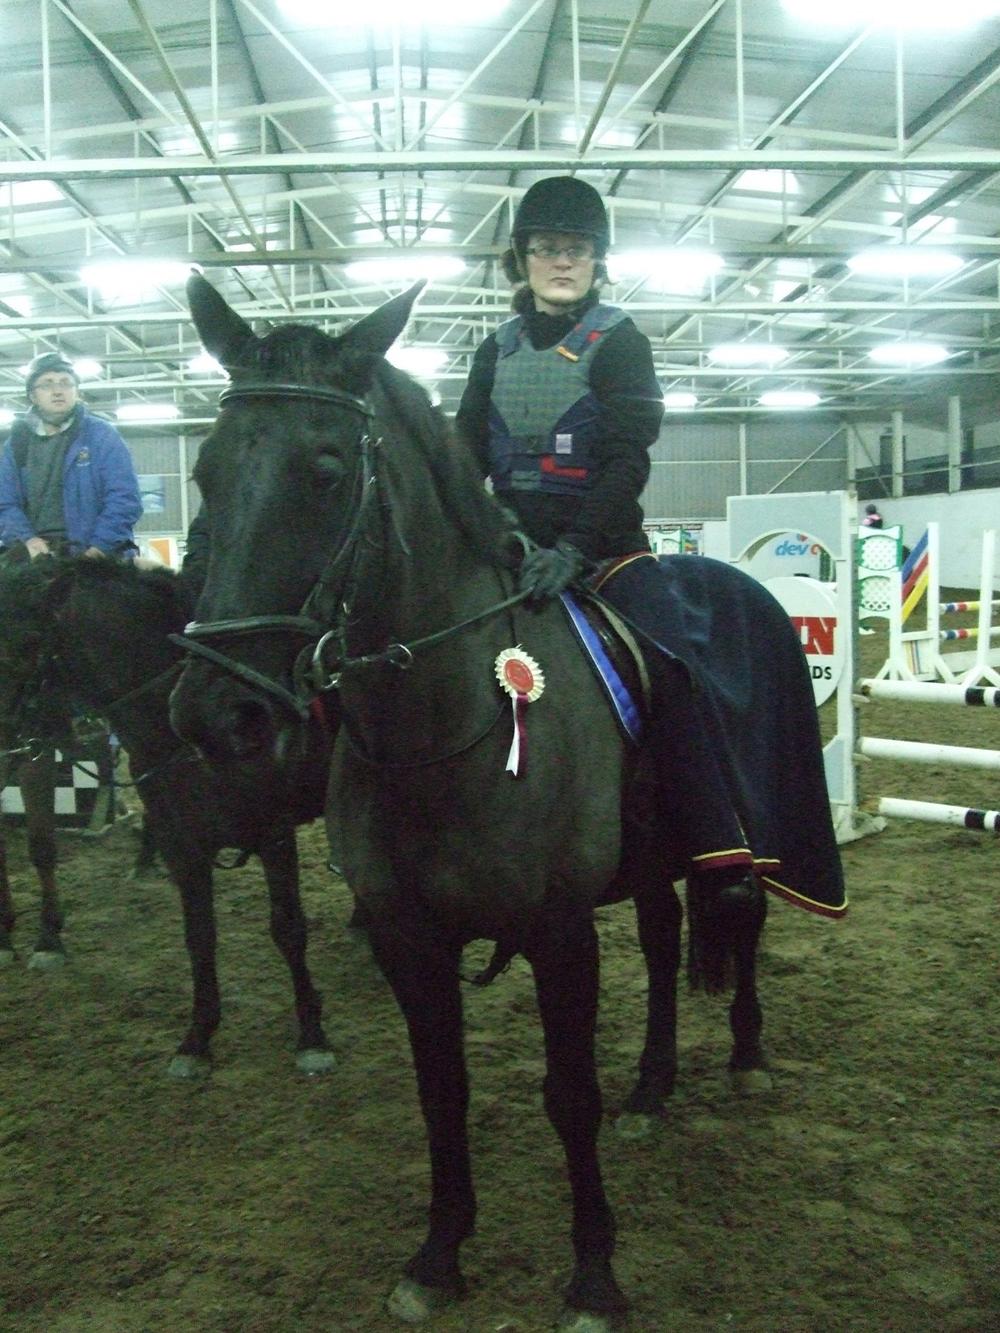 Electric Atmosphere At Kernan Equestrian Centre